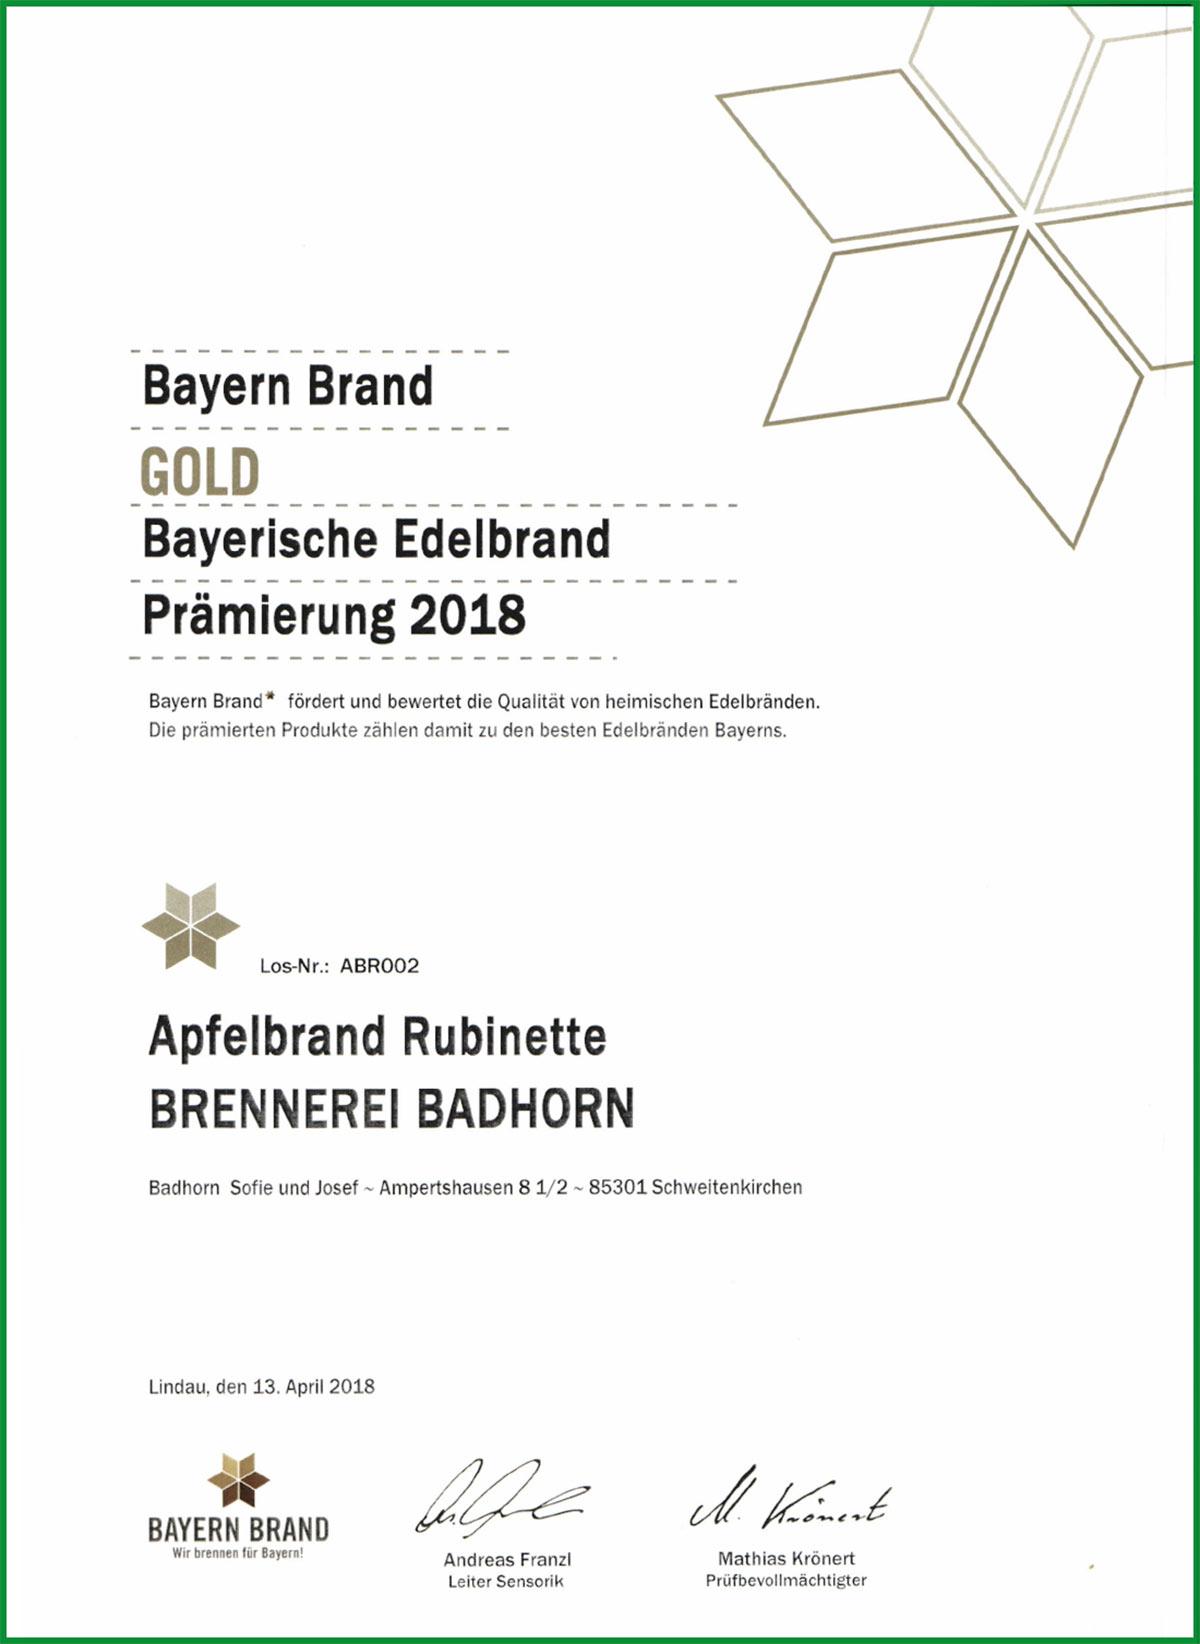 2018_bayern-brand_gold_apfelbrand-rubinette.jpg